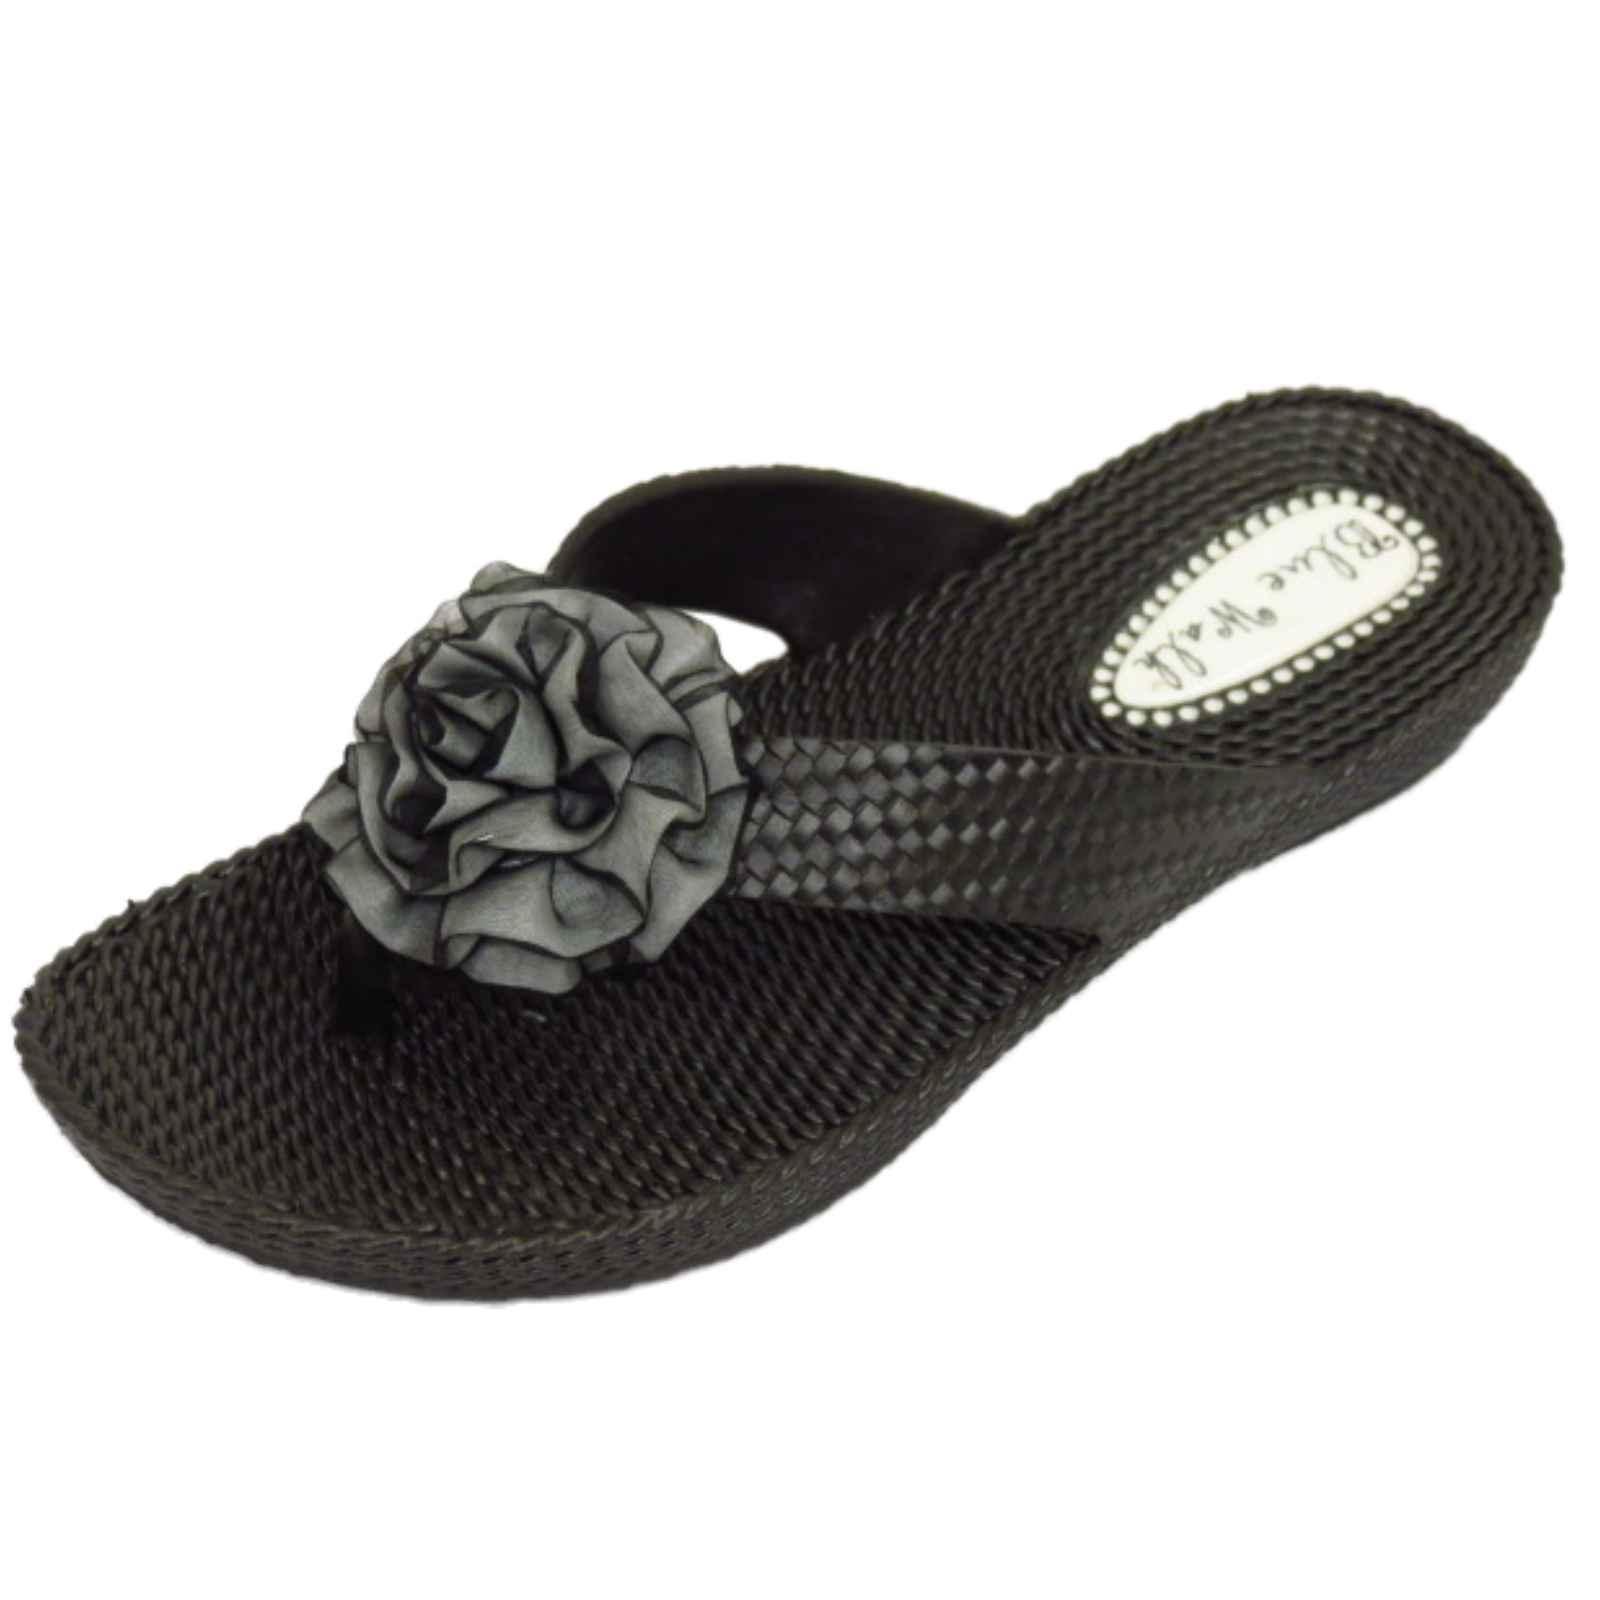 f33816b827d54 Details about WOMENS FLAT TOE-POST SANDALS BLACK FLIP-FLOP BEACH SLIP-ON  JELLY SHOES UK 3-8